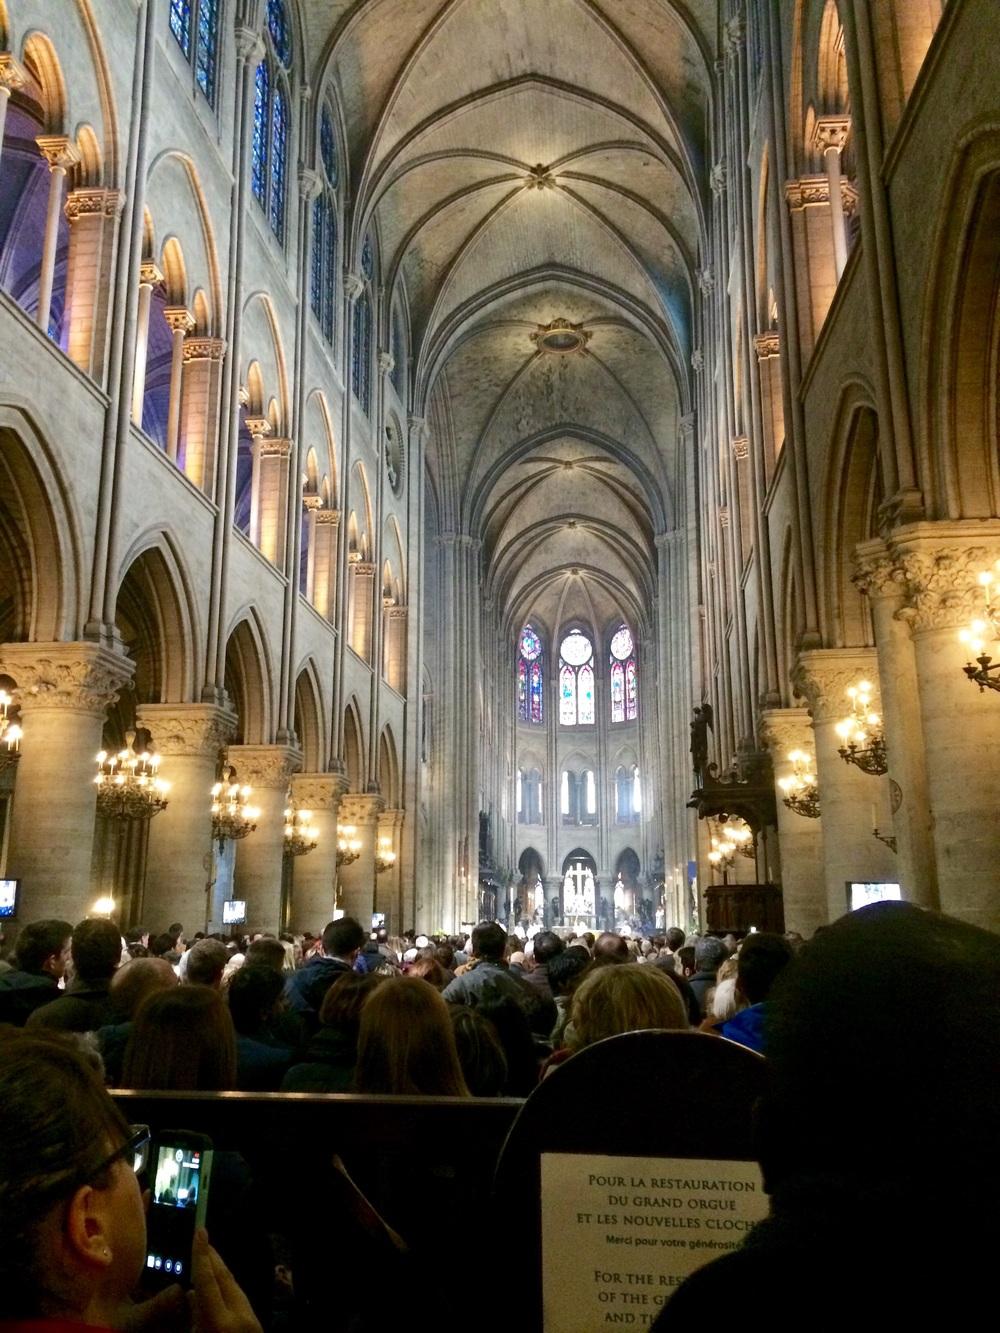 Inside Notre-Dame for Easter.